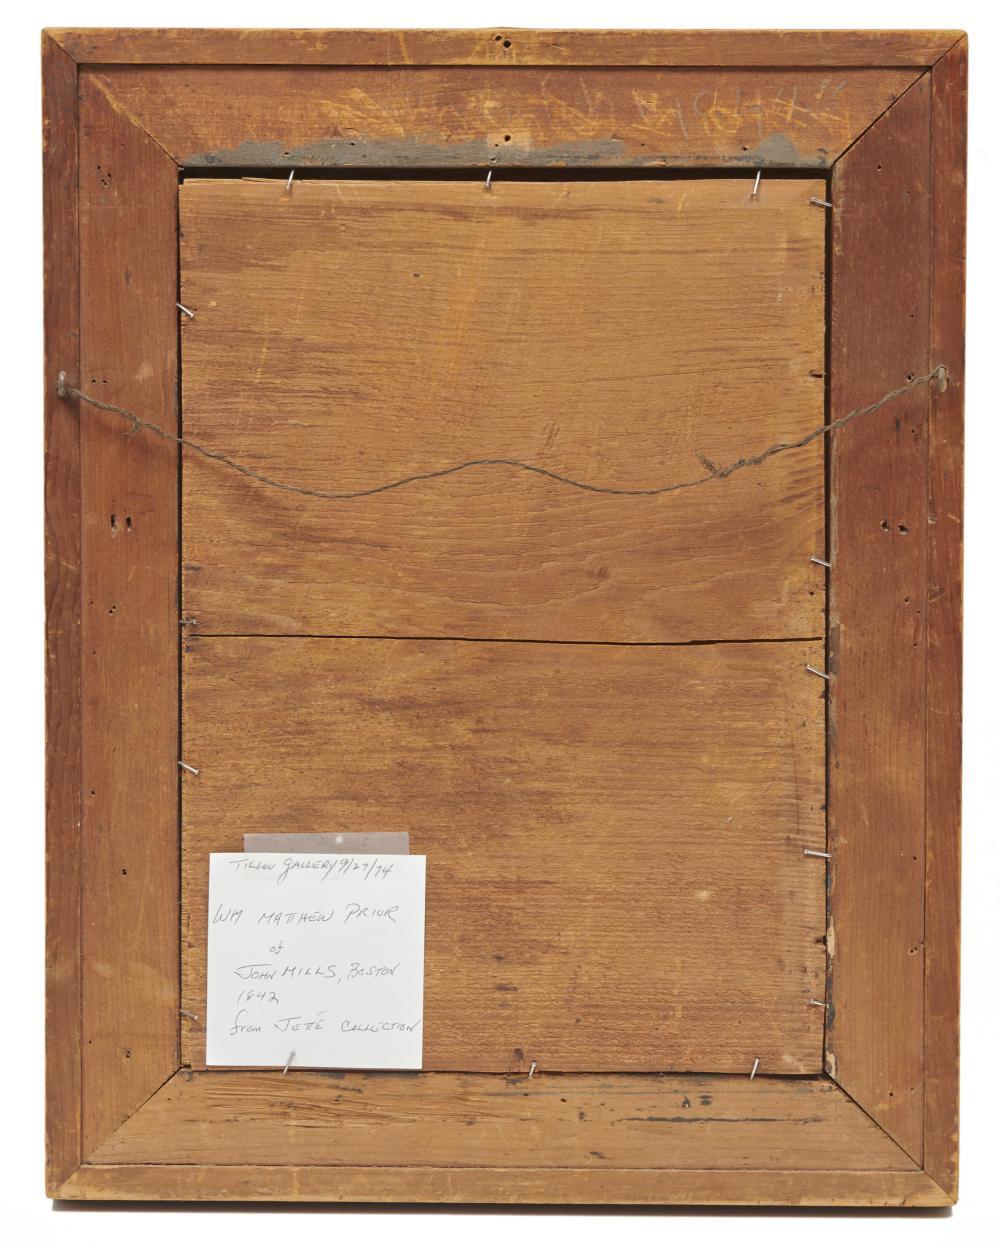 WILLIAM MATTHEW PRIOR, (American, 1806-1873), John Mills, oil on panel, 13 1/2 x 9 1/2 in., frame: 18 1/2 x 14 1/2 in.